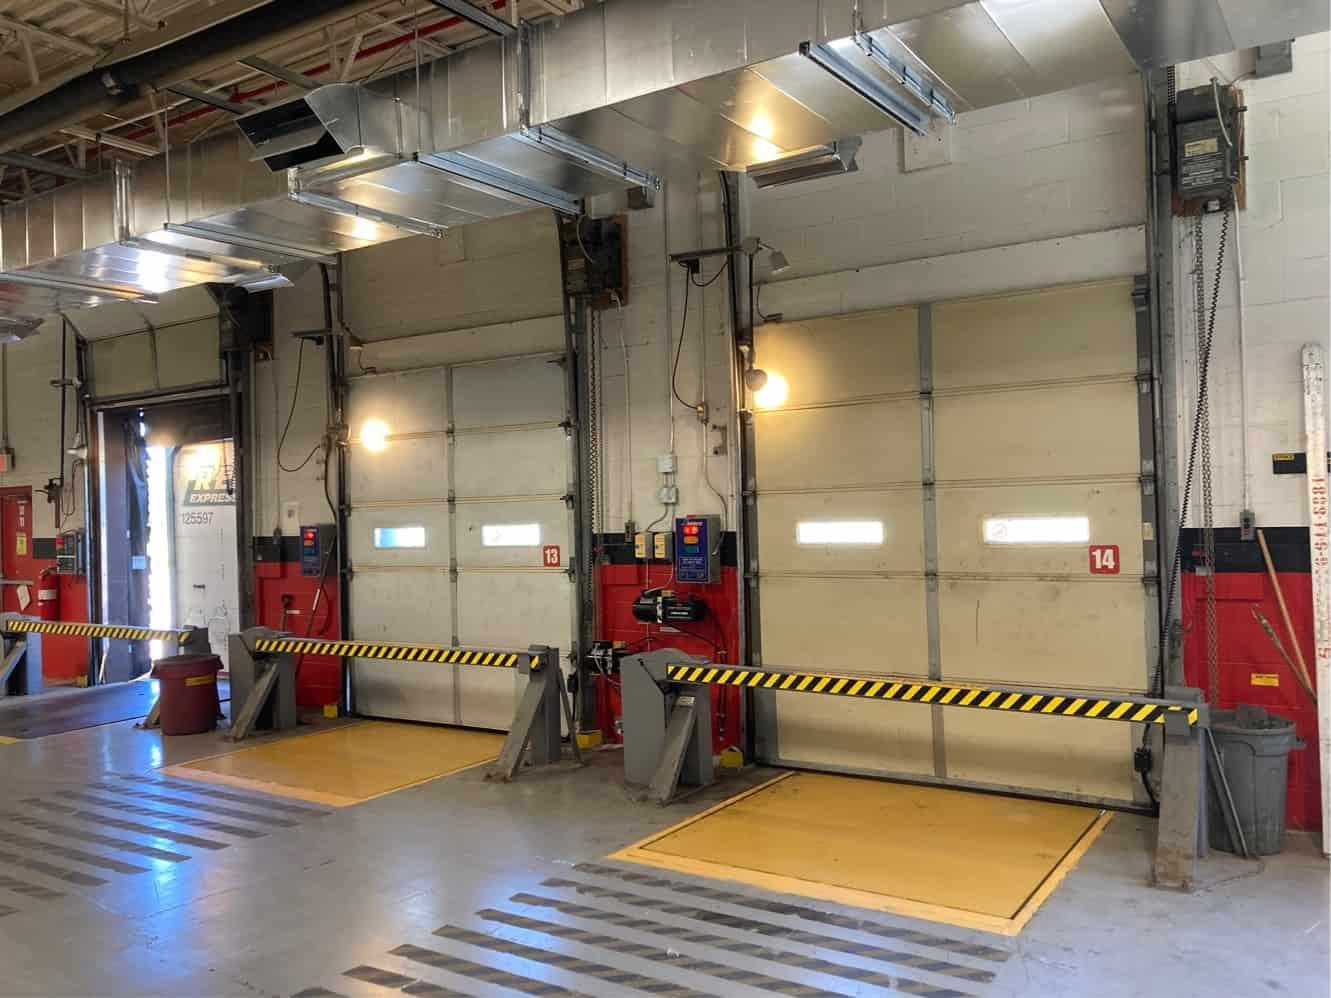 Loading dock at a distribution center Sudbury Ontario